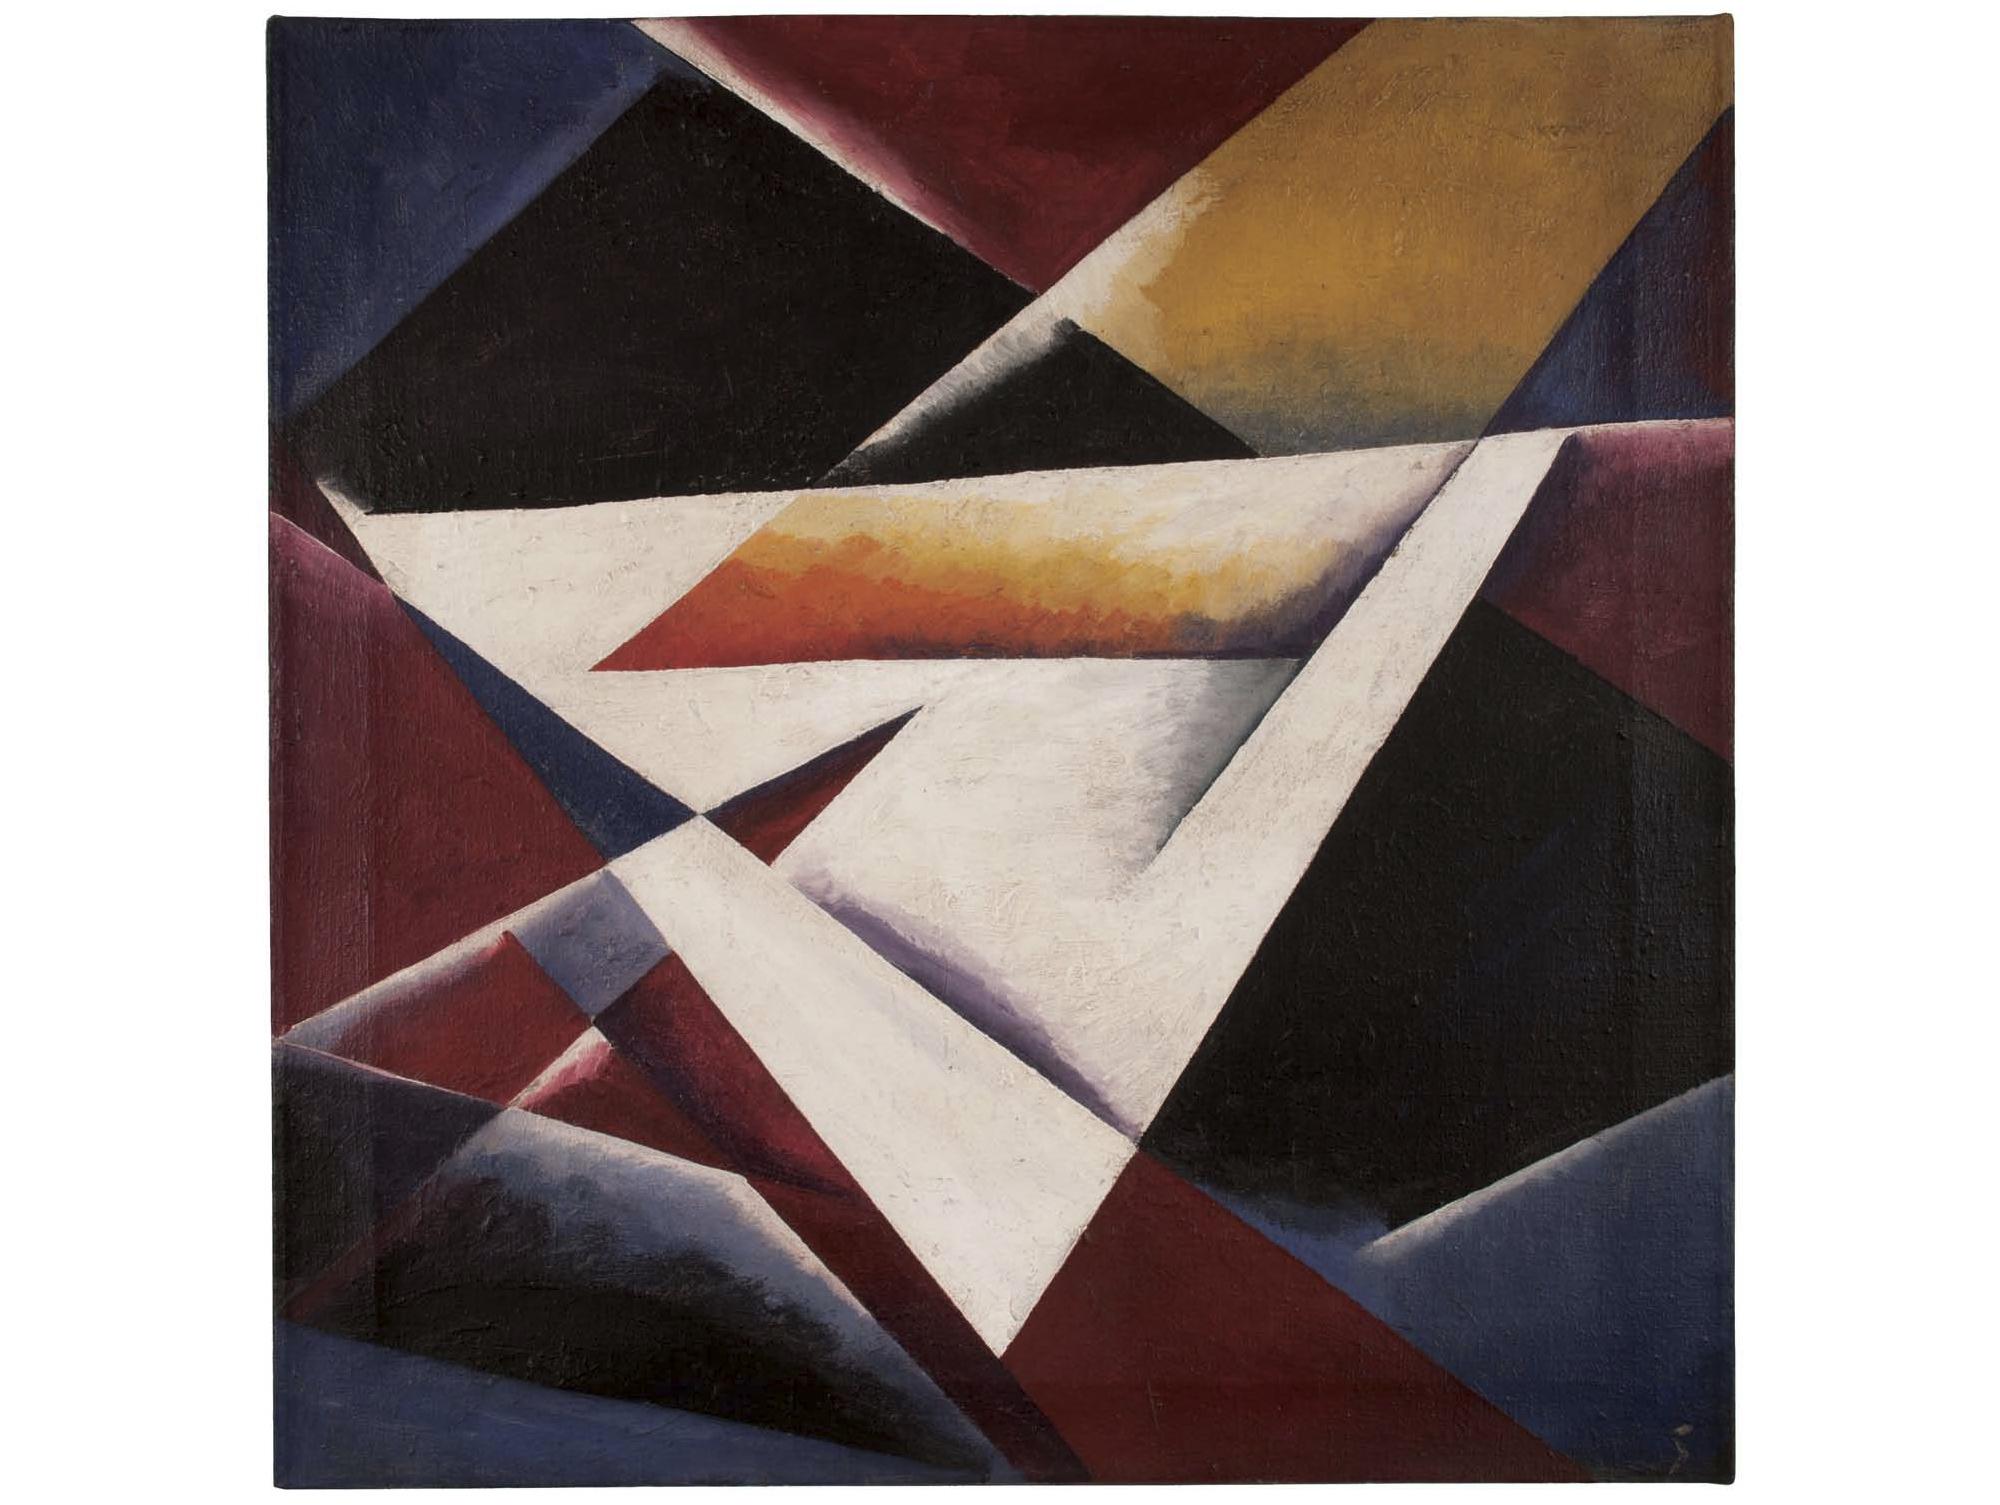 Unattributed. Unsigned. In the style of Lyubov Popova.    Oil on canvas, 60 x 60 cm.